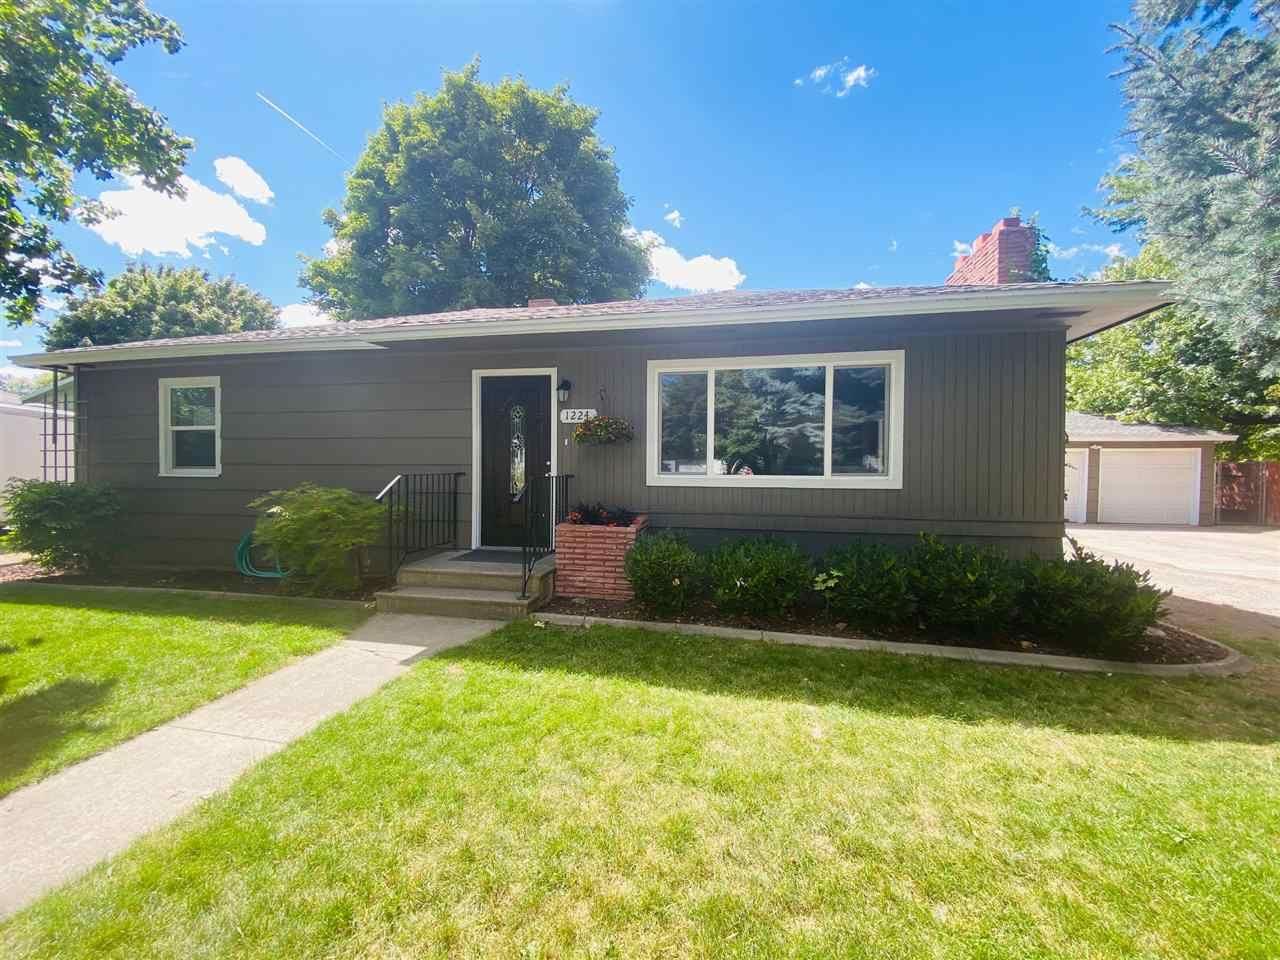 1224 S Skipworth Rd, Spokane Valley, WA 99206-5590 - #: 202020448